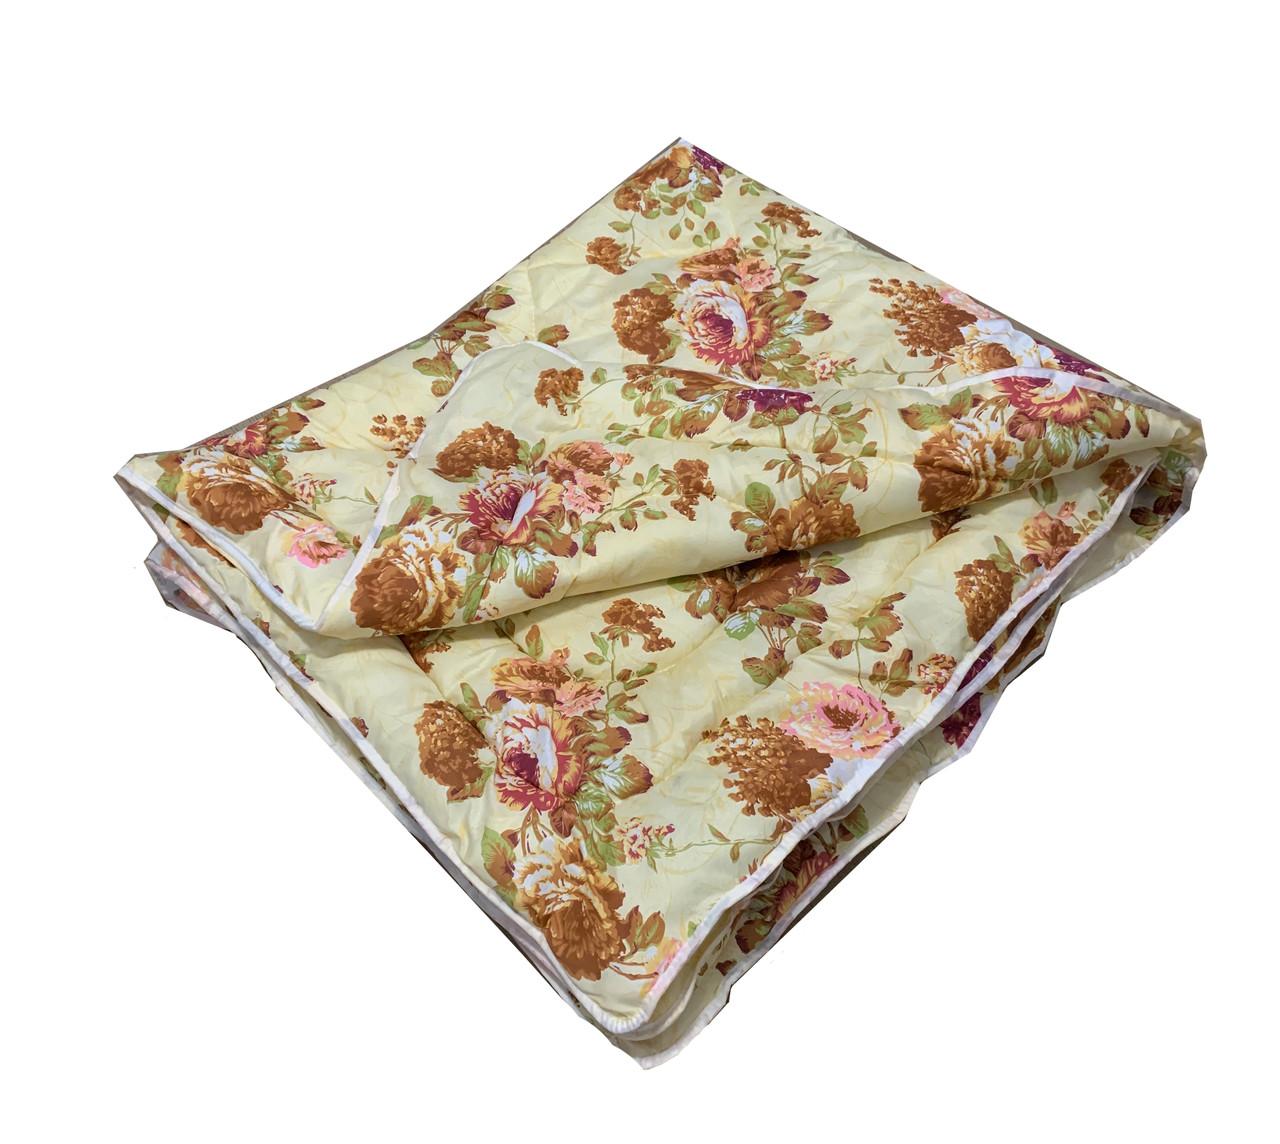 Одеяло бежевое полуторное, холлофайбер 150*220 см, Украина